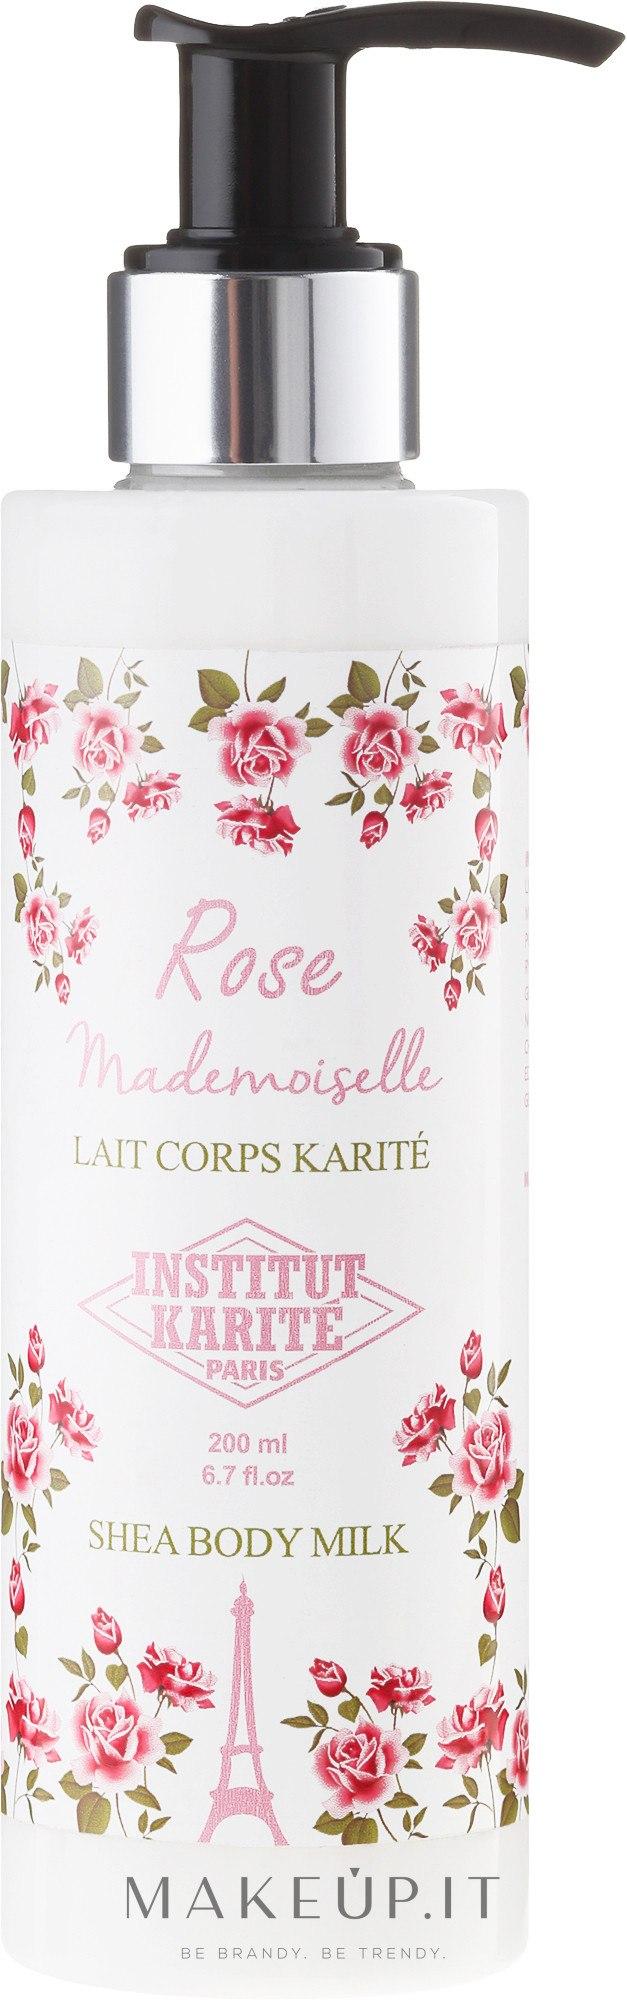 Latte corpo - Institut Karite Rose Mademoiselle Shea Body Milk — foto 200 ml